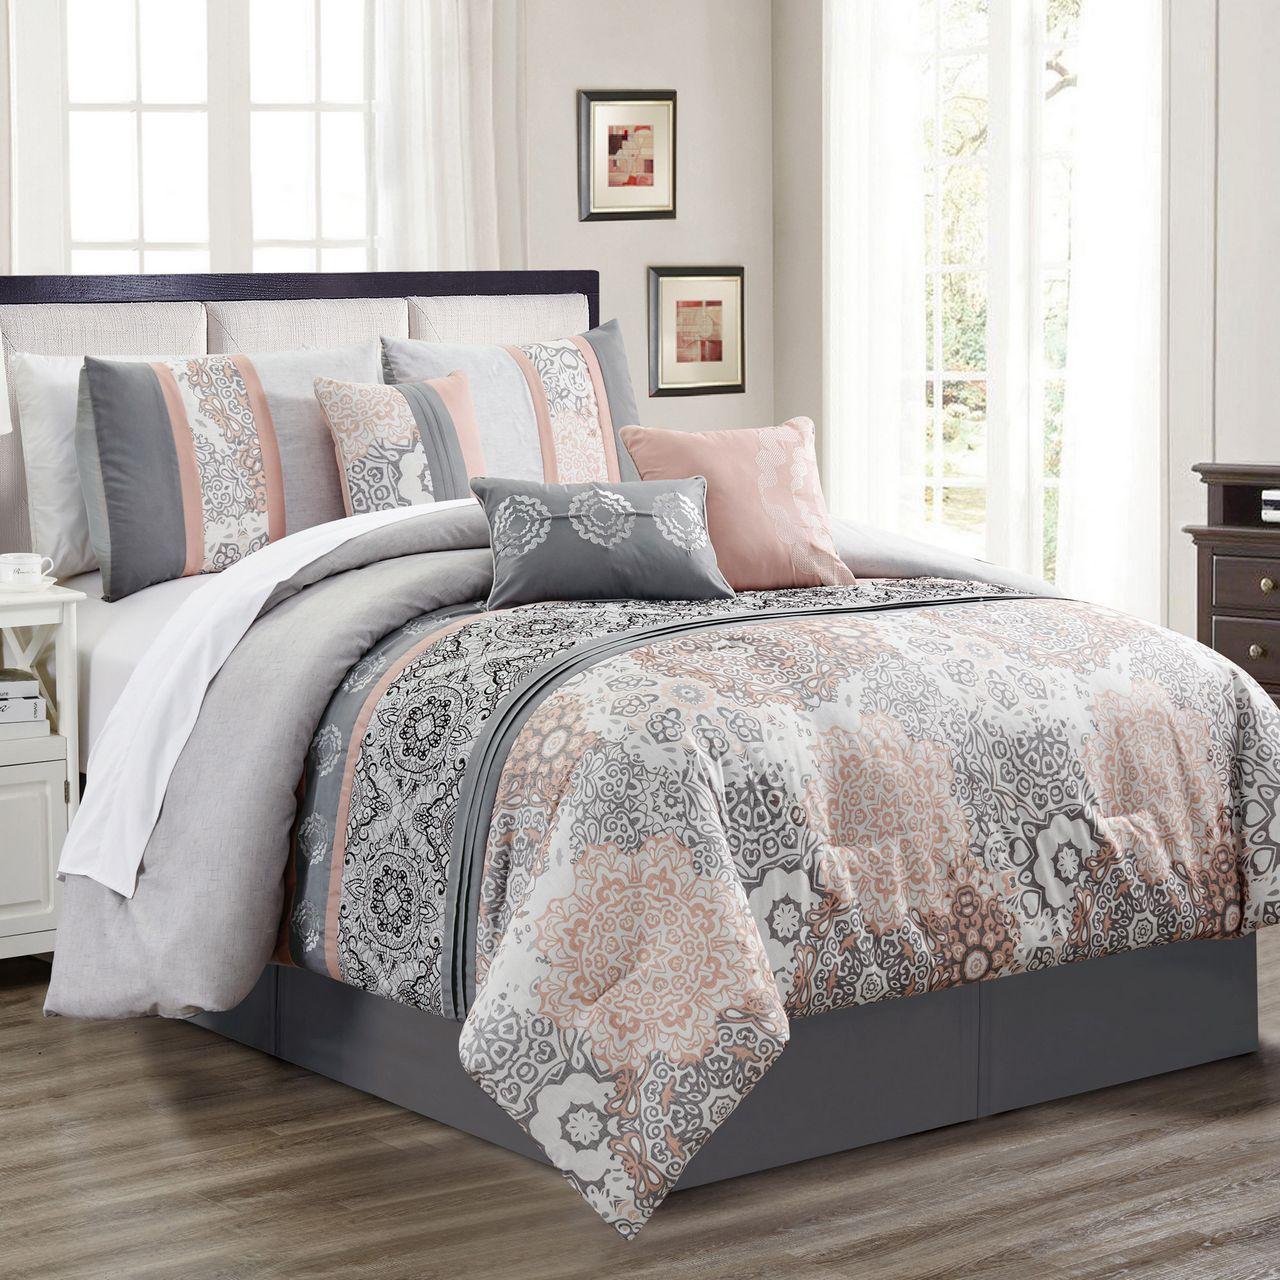 7 Piece Poplar Blush/Gray Comforter Set